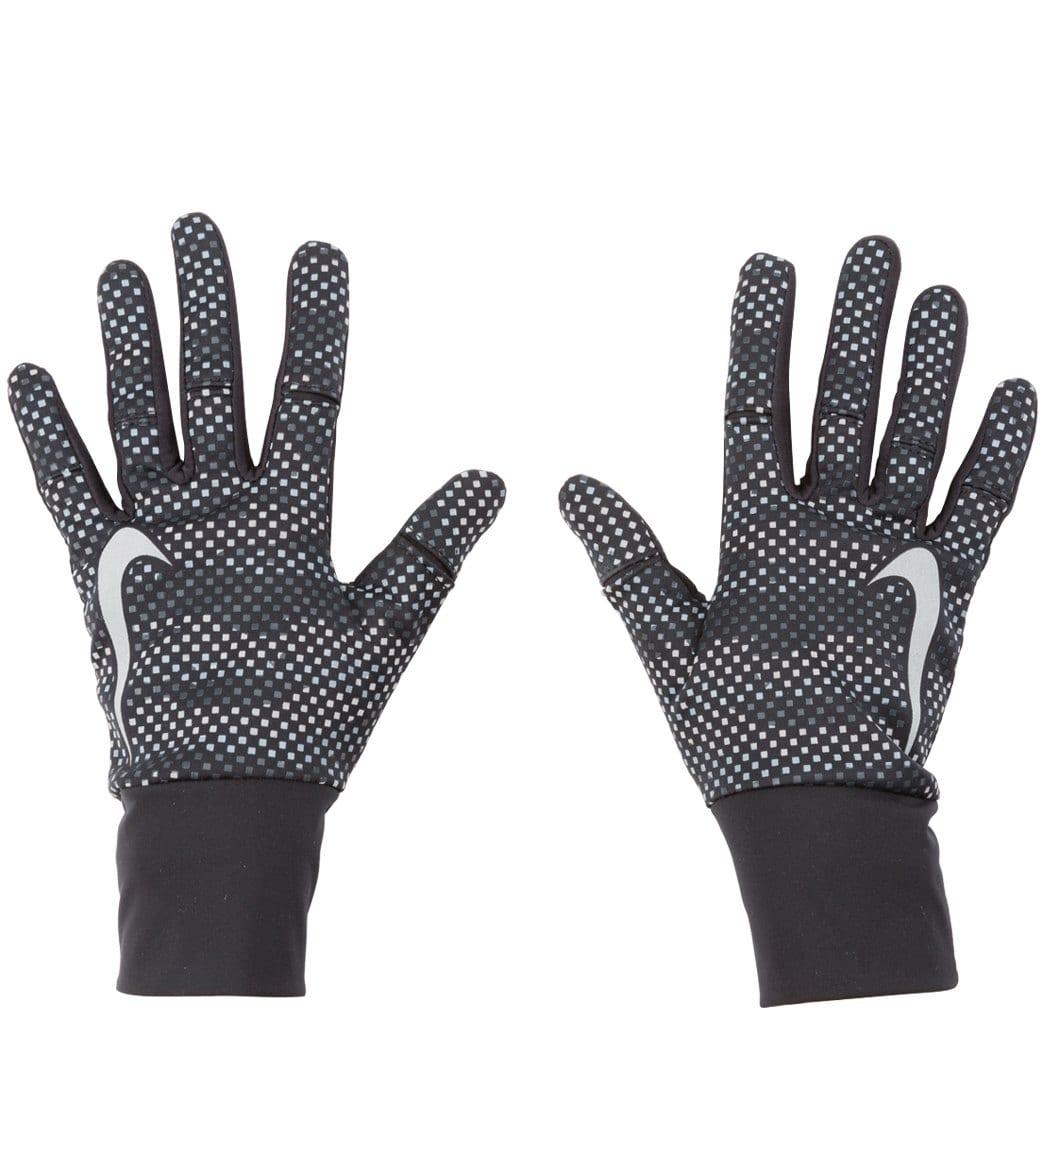 Nike Women s Vapor Flash 2.0 Run Gloves at SwimOutlet.com - Free Shipping 2f75af08e